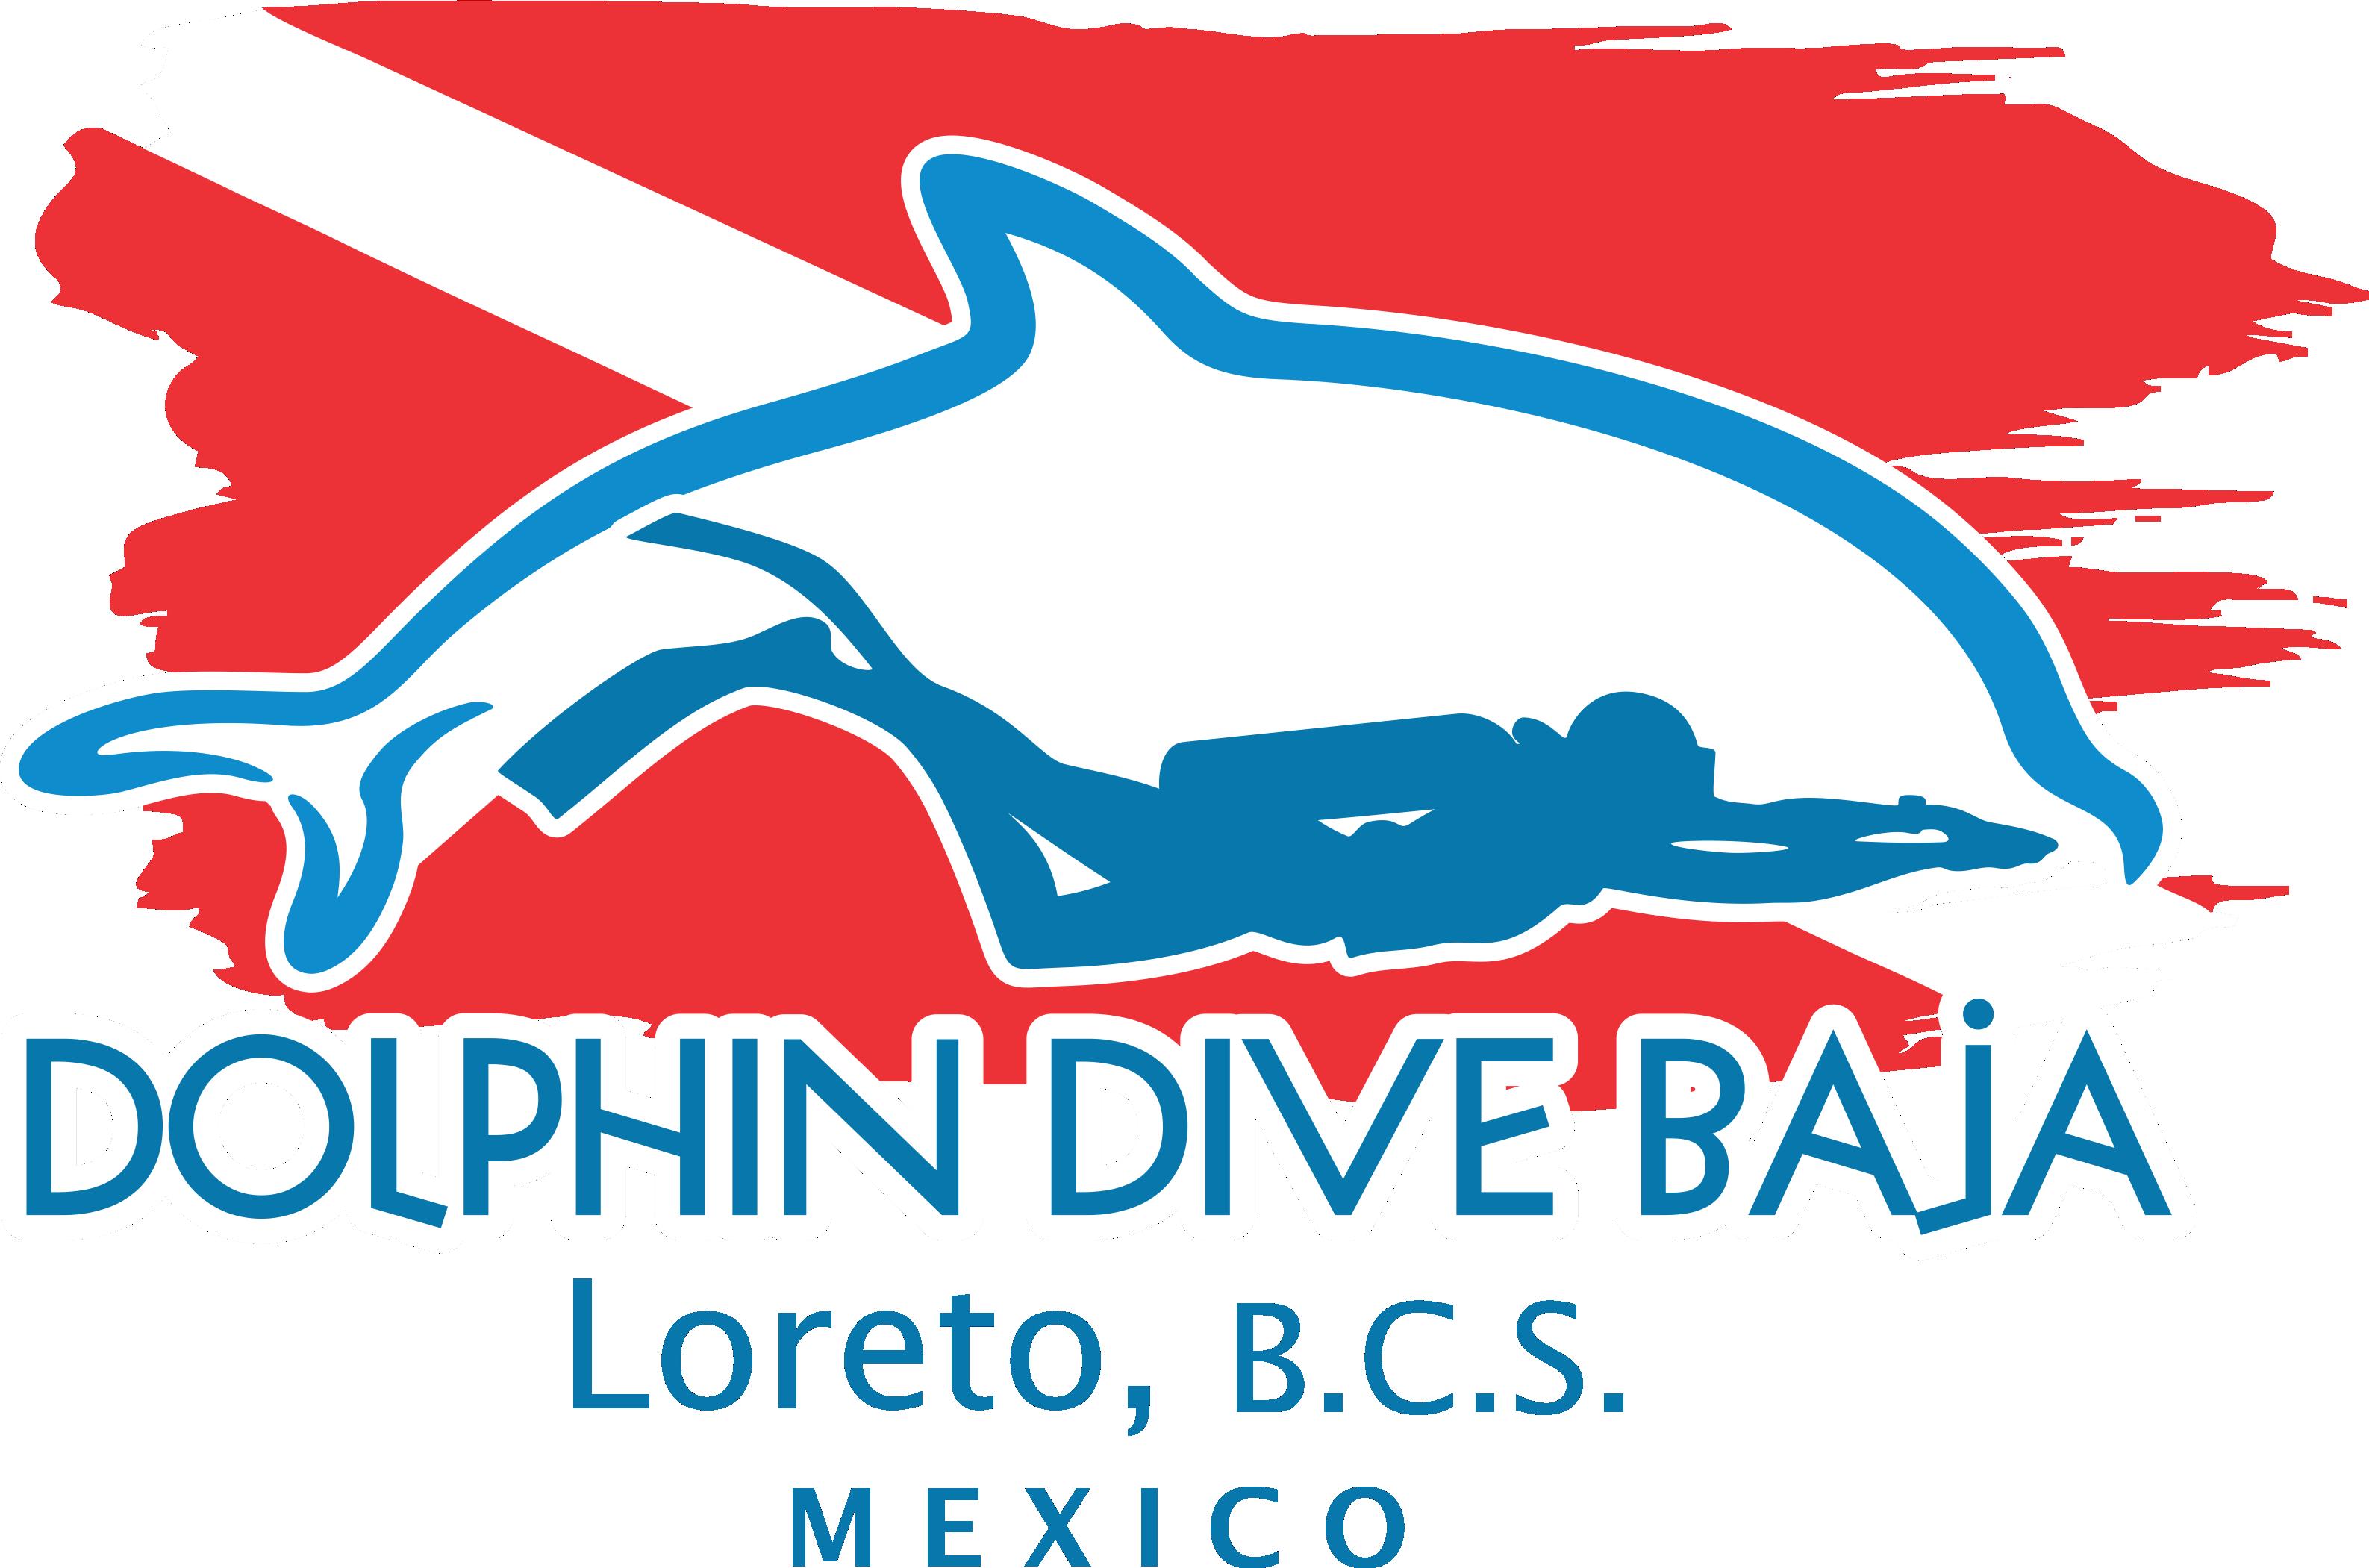 Dolphin clipart diving dolphin. Loreto mexico home dive